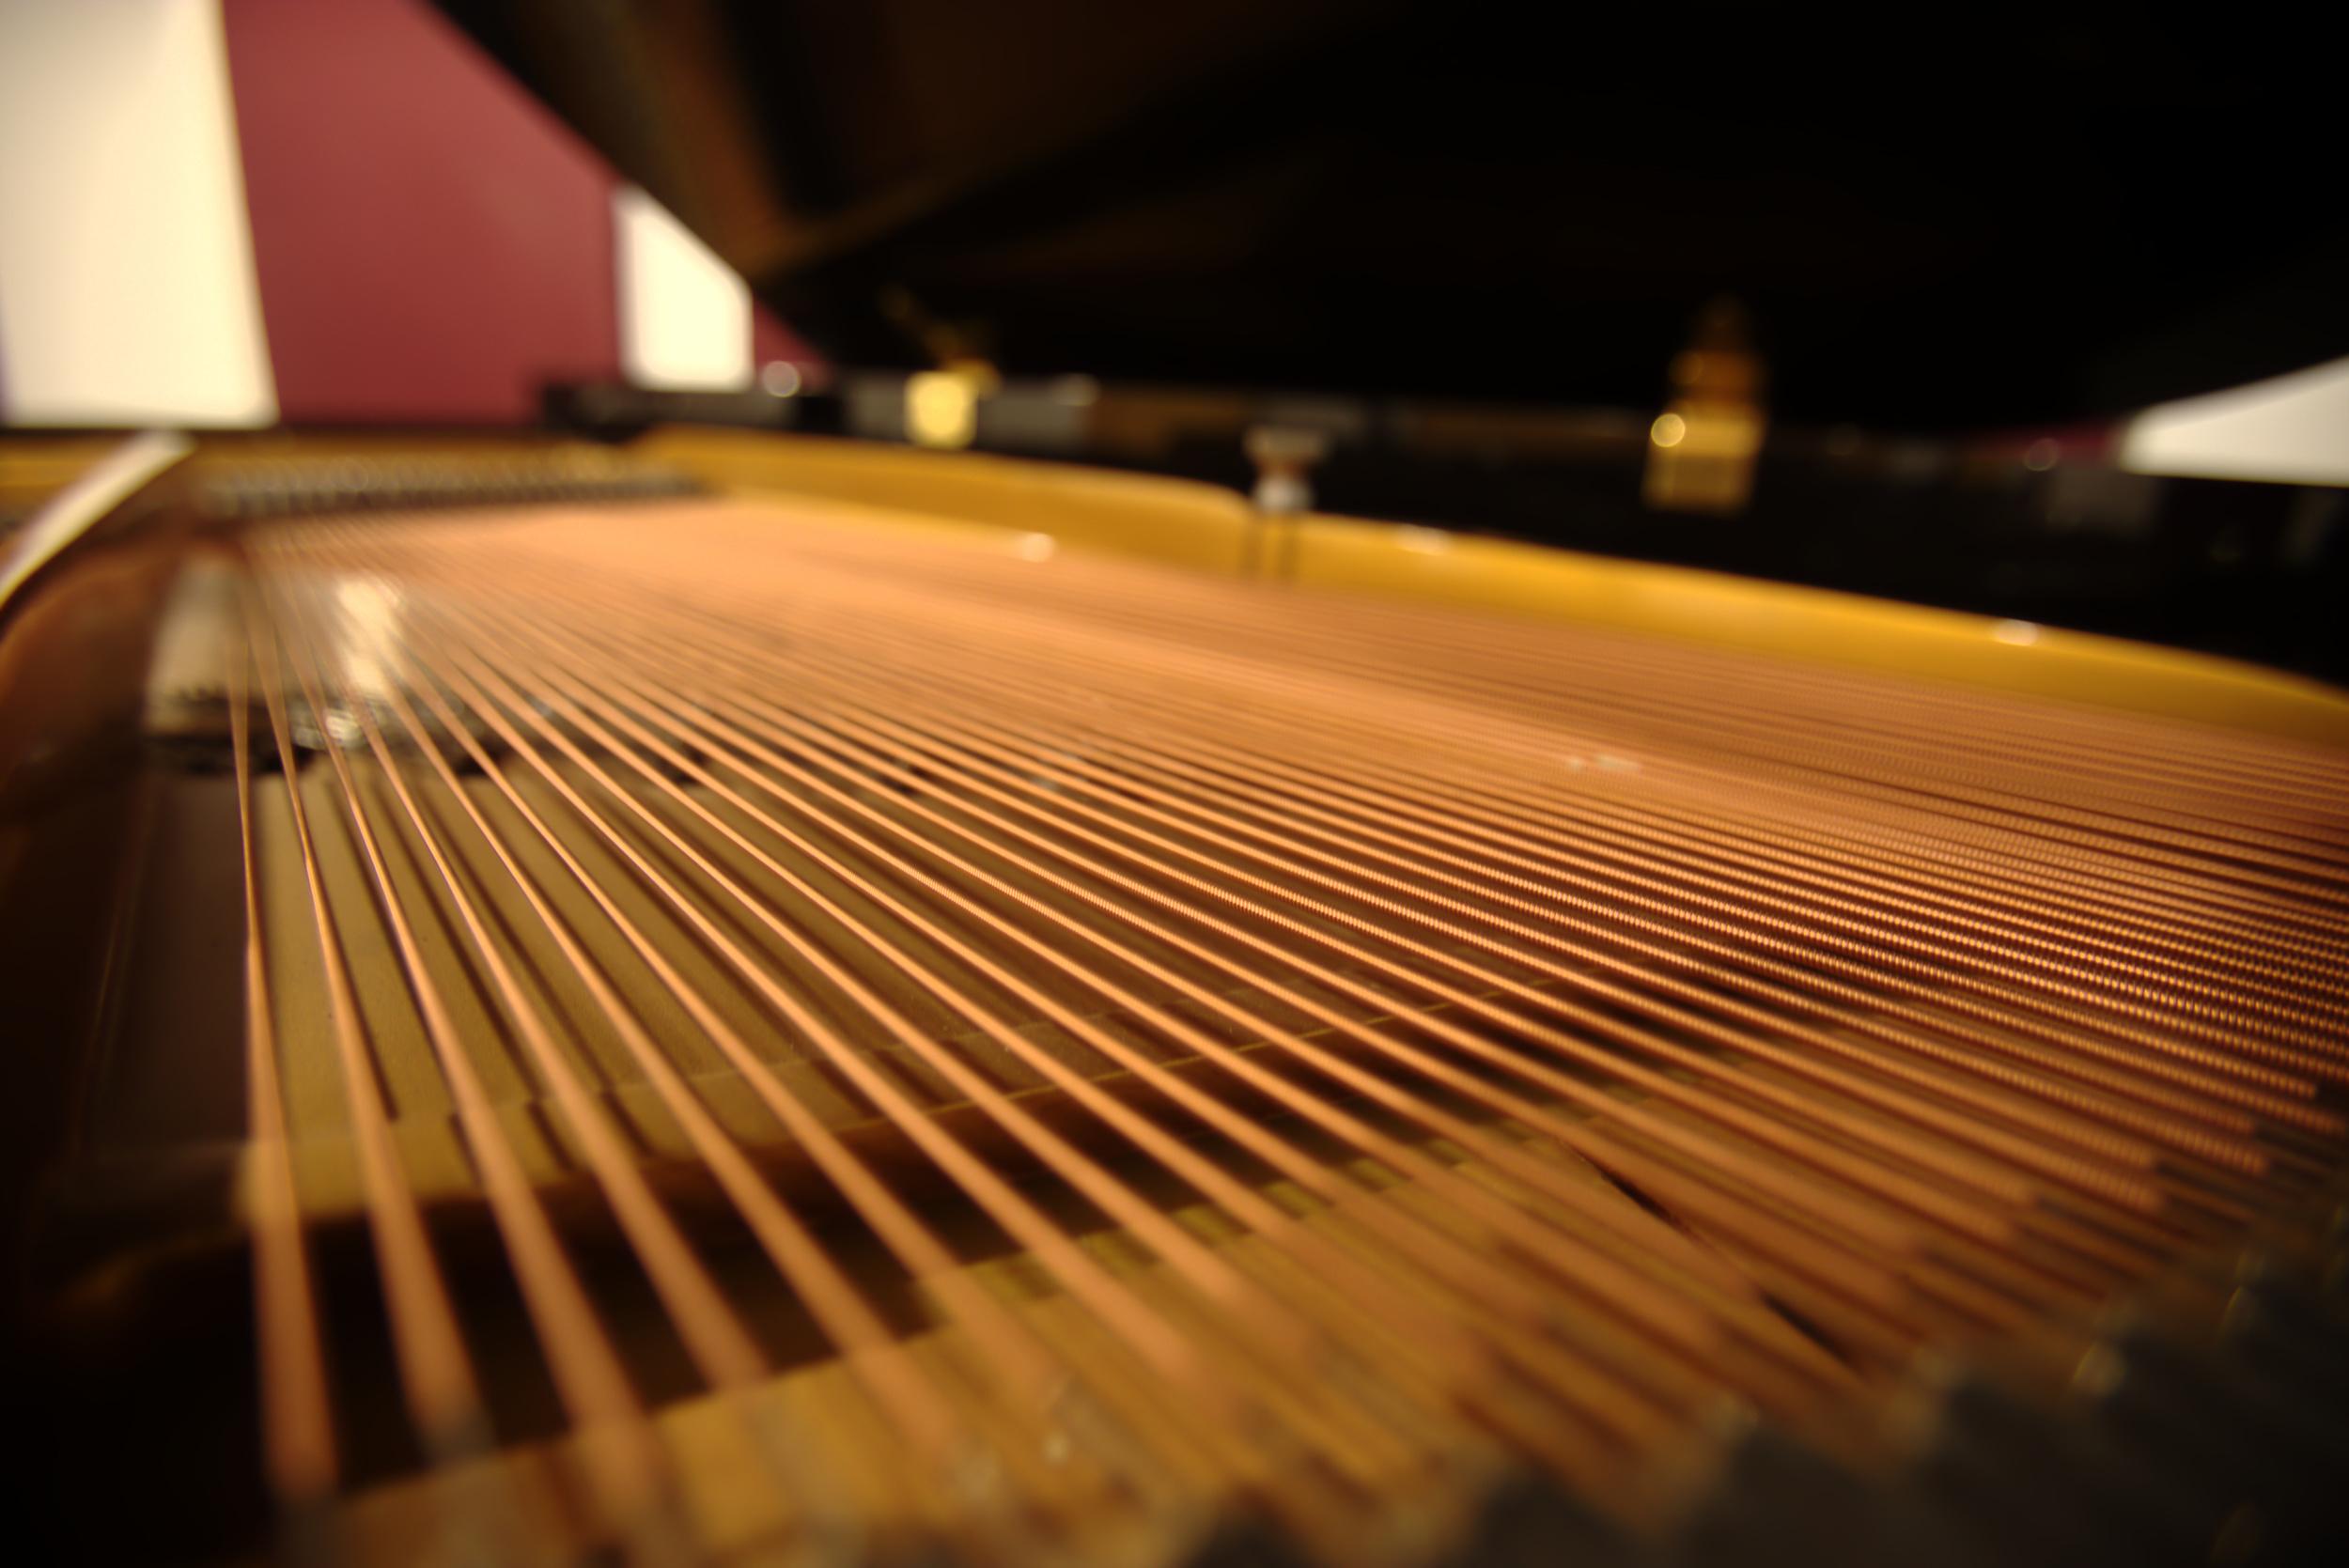 Achat d'un piano, Chapman Piano Studio, RCM, Montreal. Photo Credit. Yuuki Omori 2014.